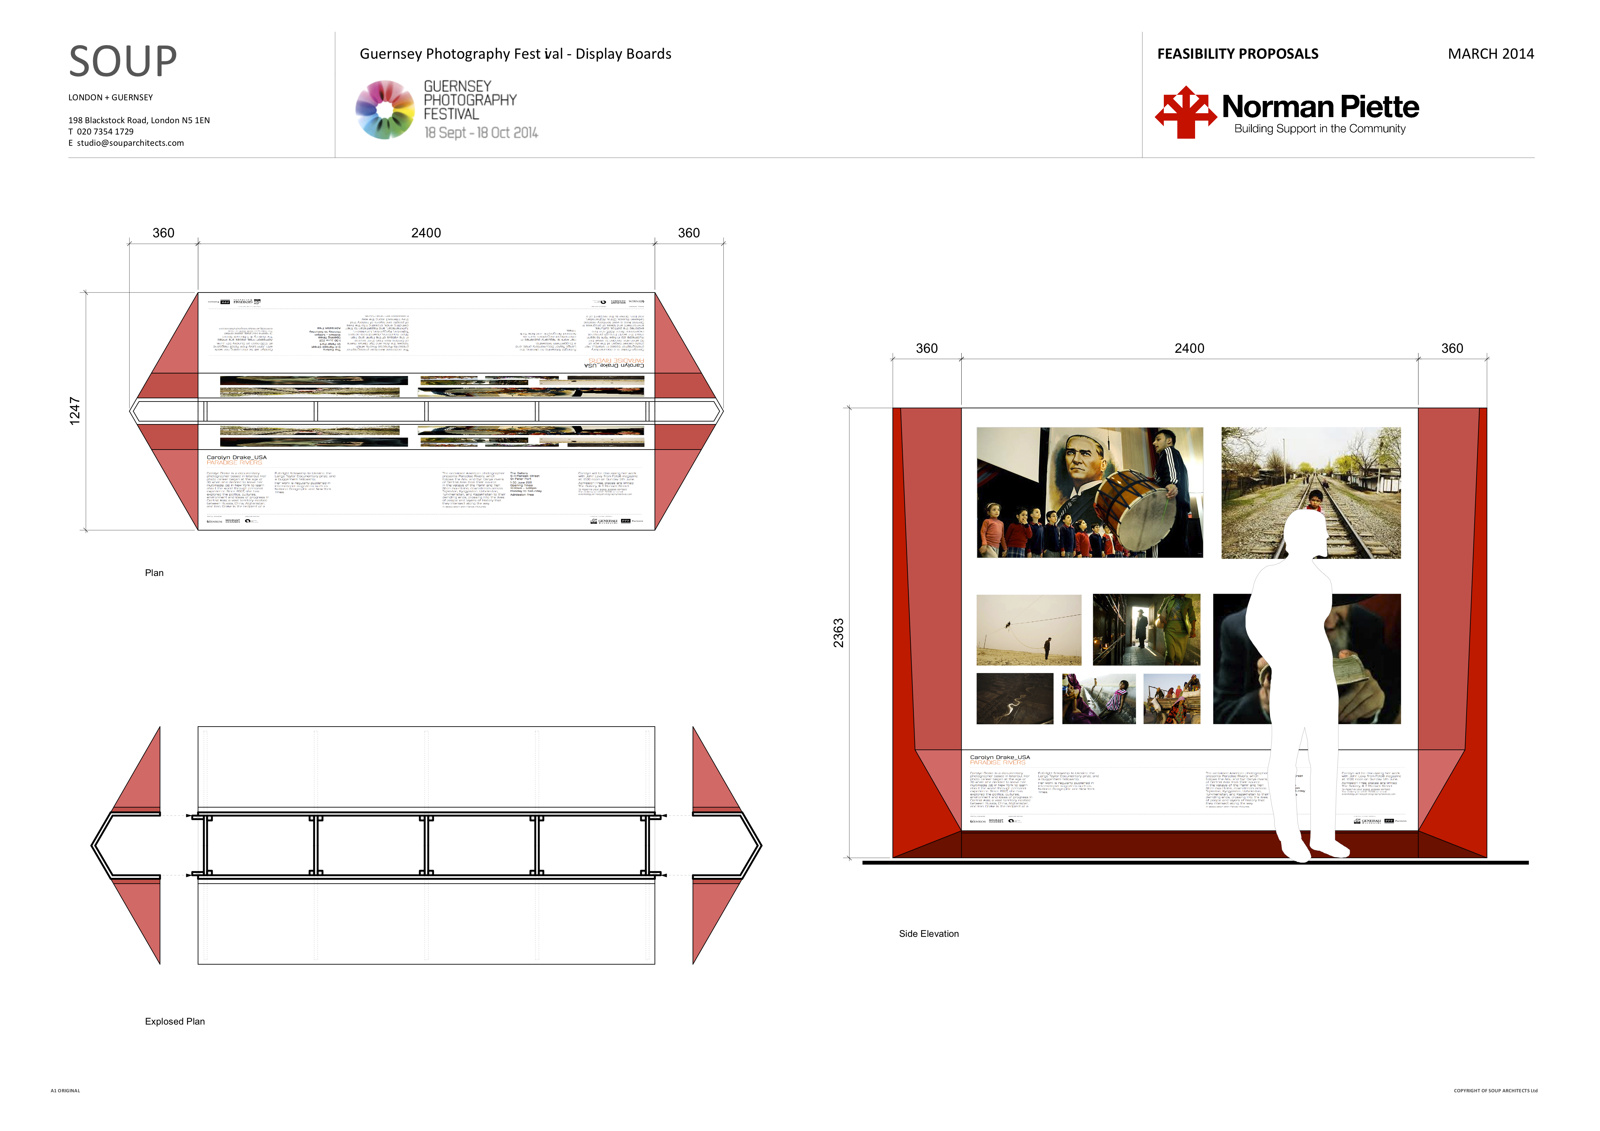 2027cdf852adf224-GPF_ExhibitionBoard_WorkingDrawings01.jpg